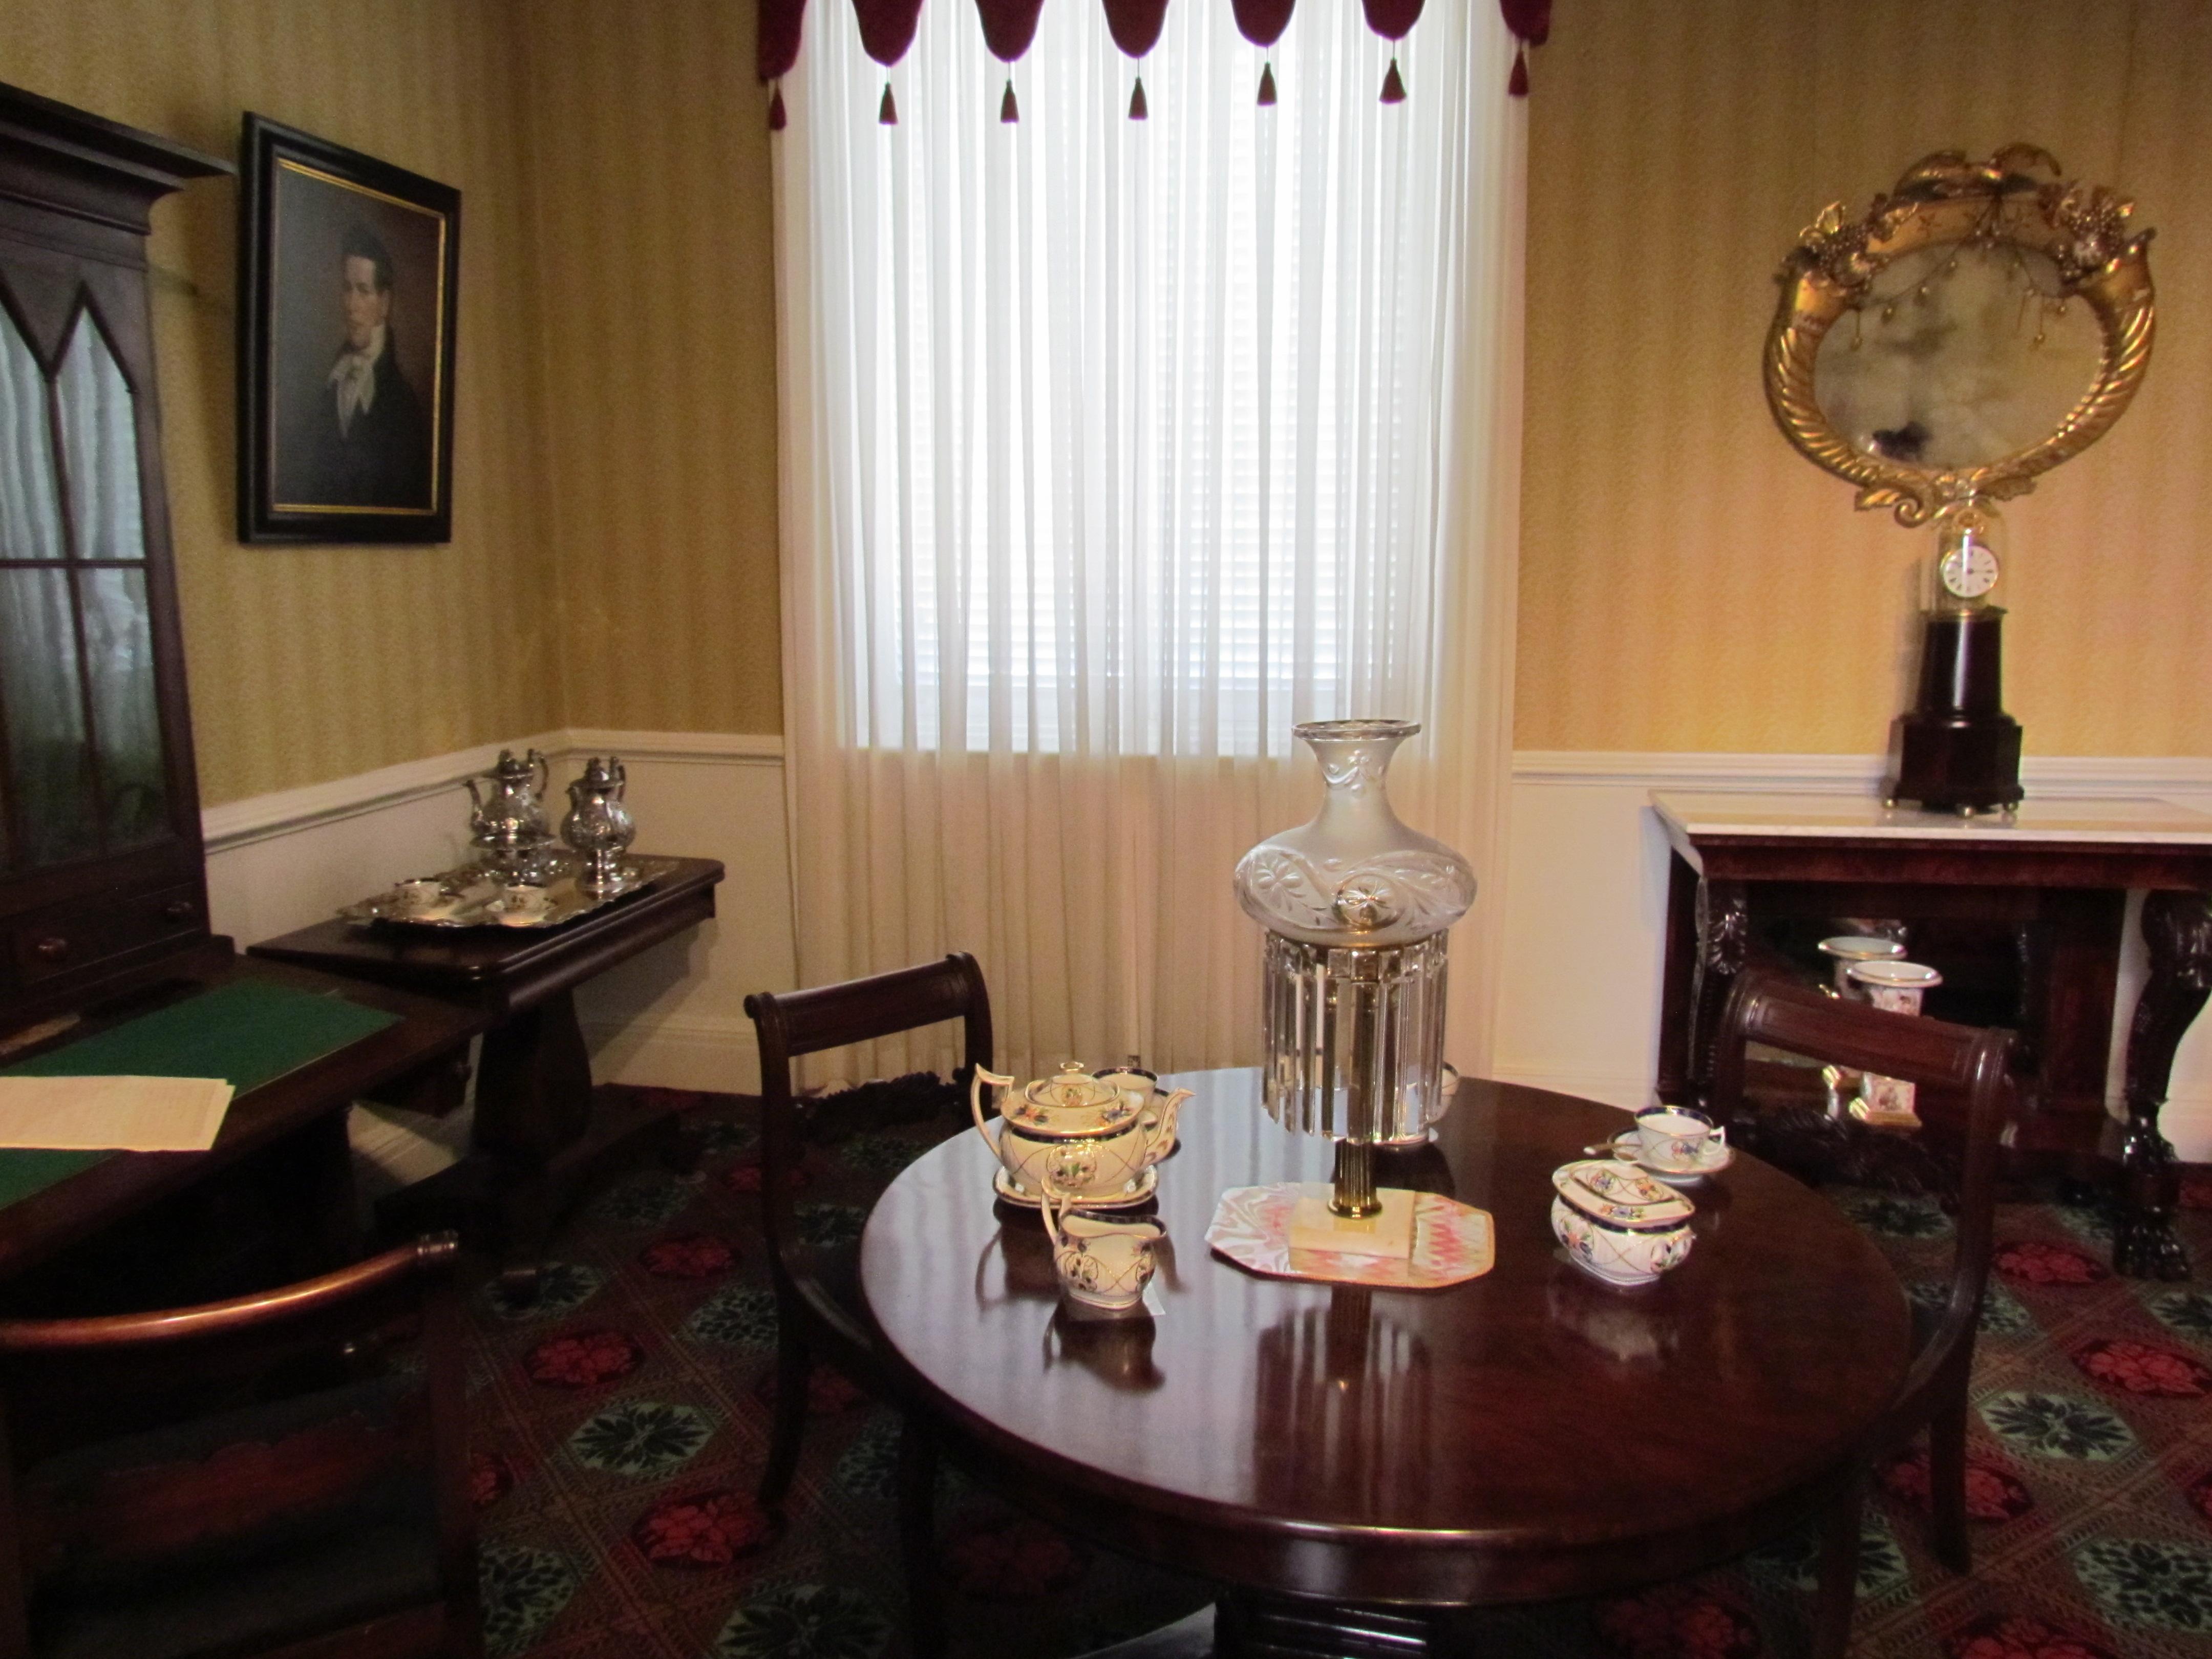 Dar Museum Period Rooms Daughters Of The American Revolution